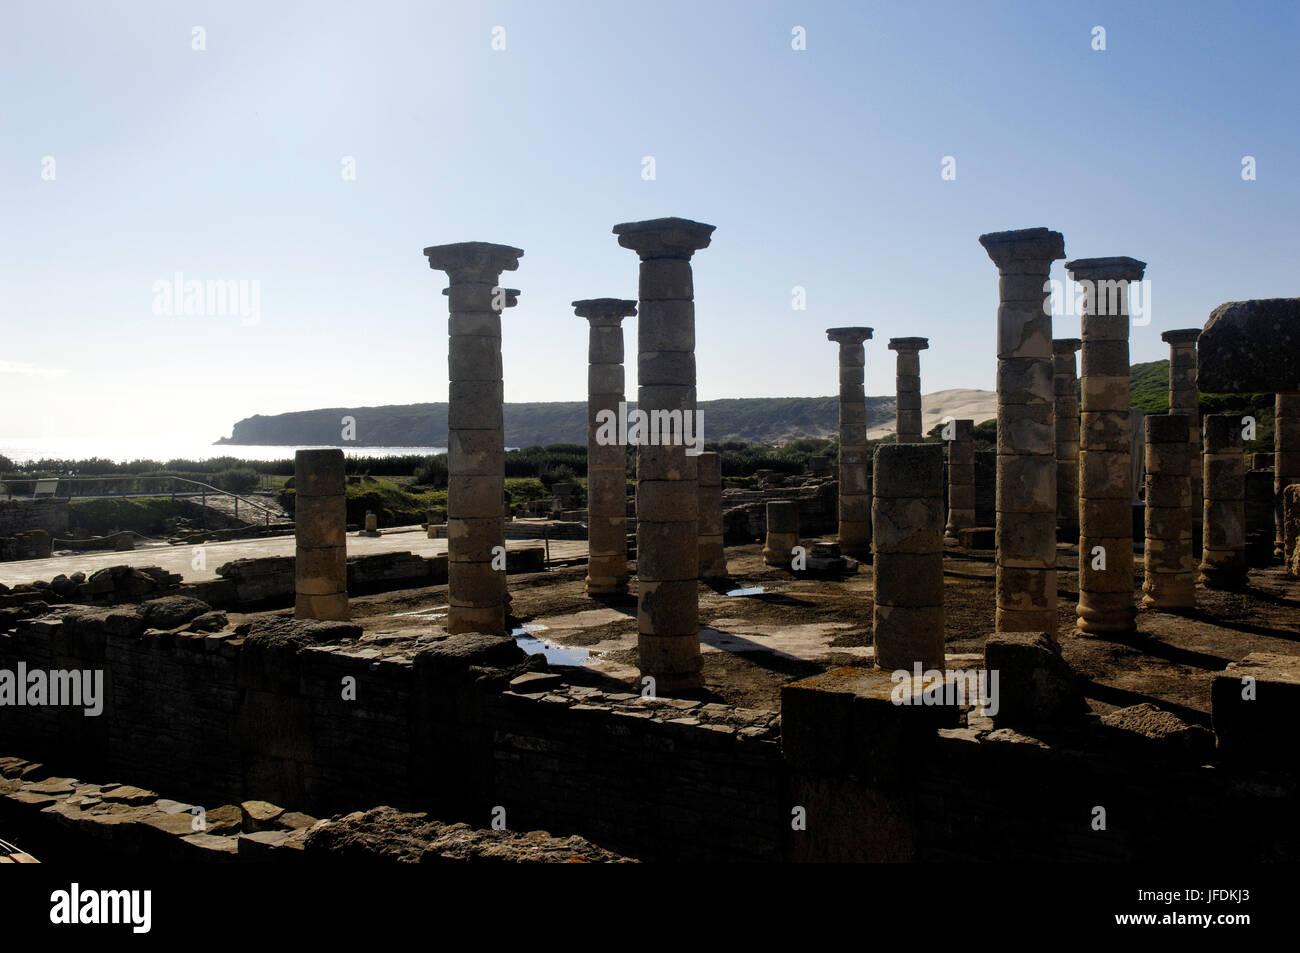 Baelo Claudia ancient Roman town located in Bolonia, Cadiz, Andalusia, Spain Stock Photo